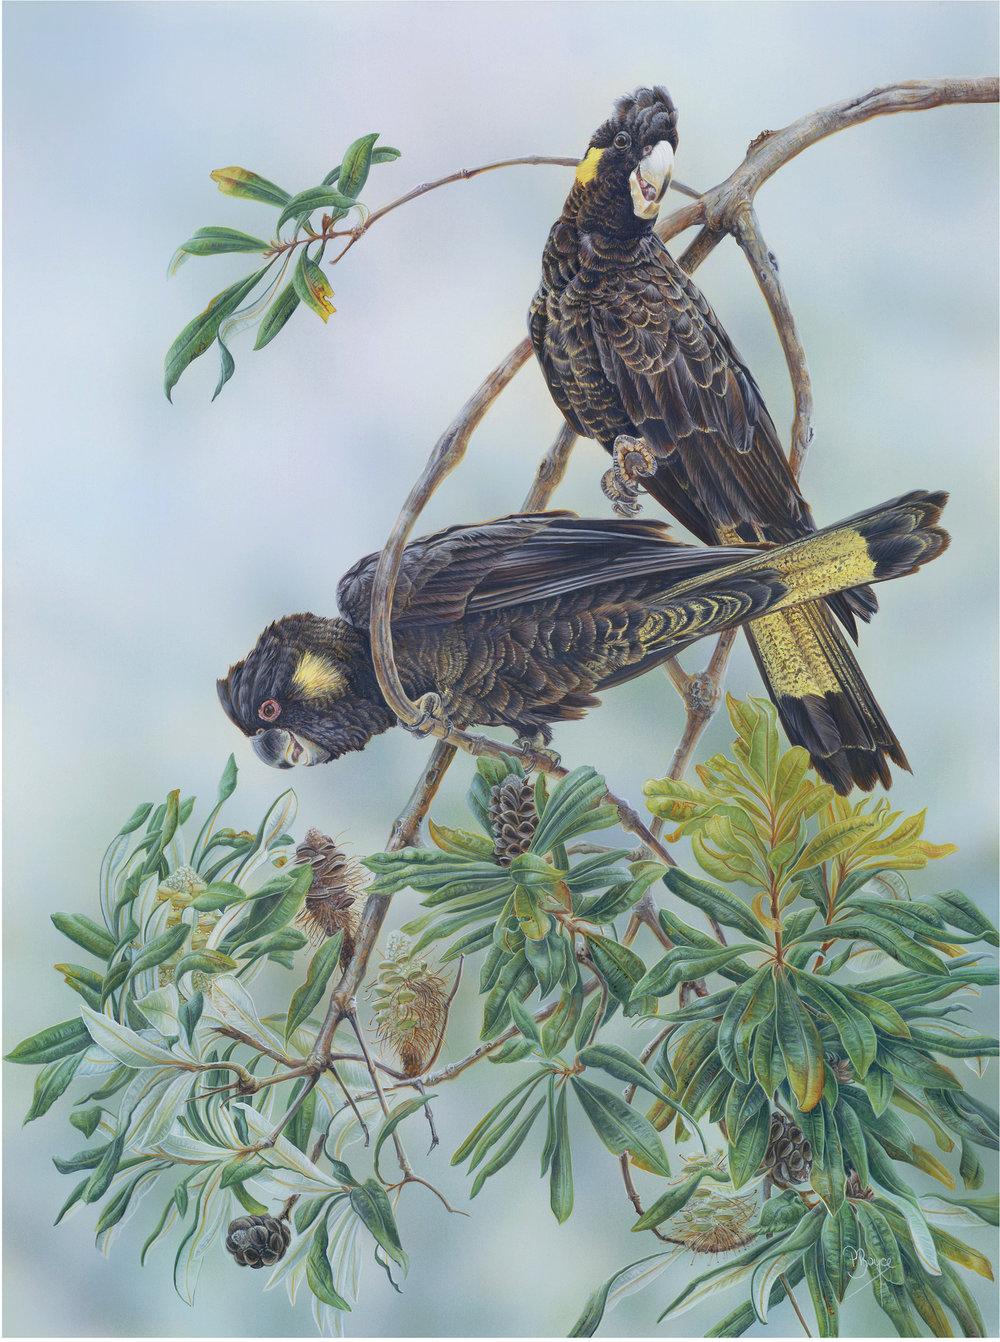 """Banksia Bouquet"" by Peta Boyce"